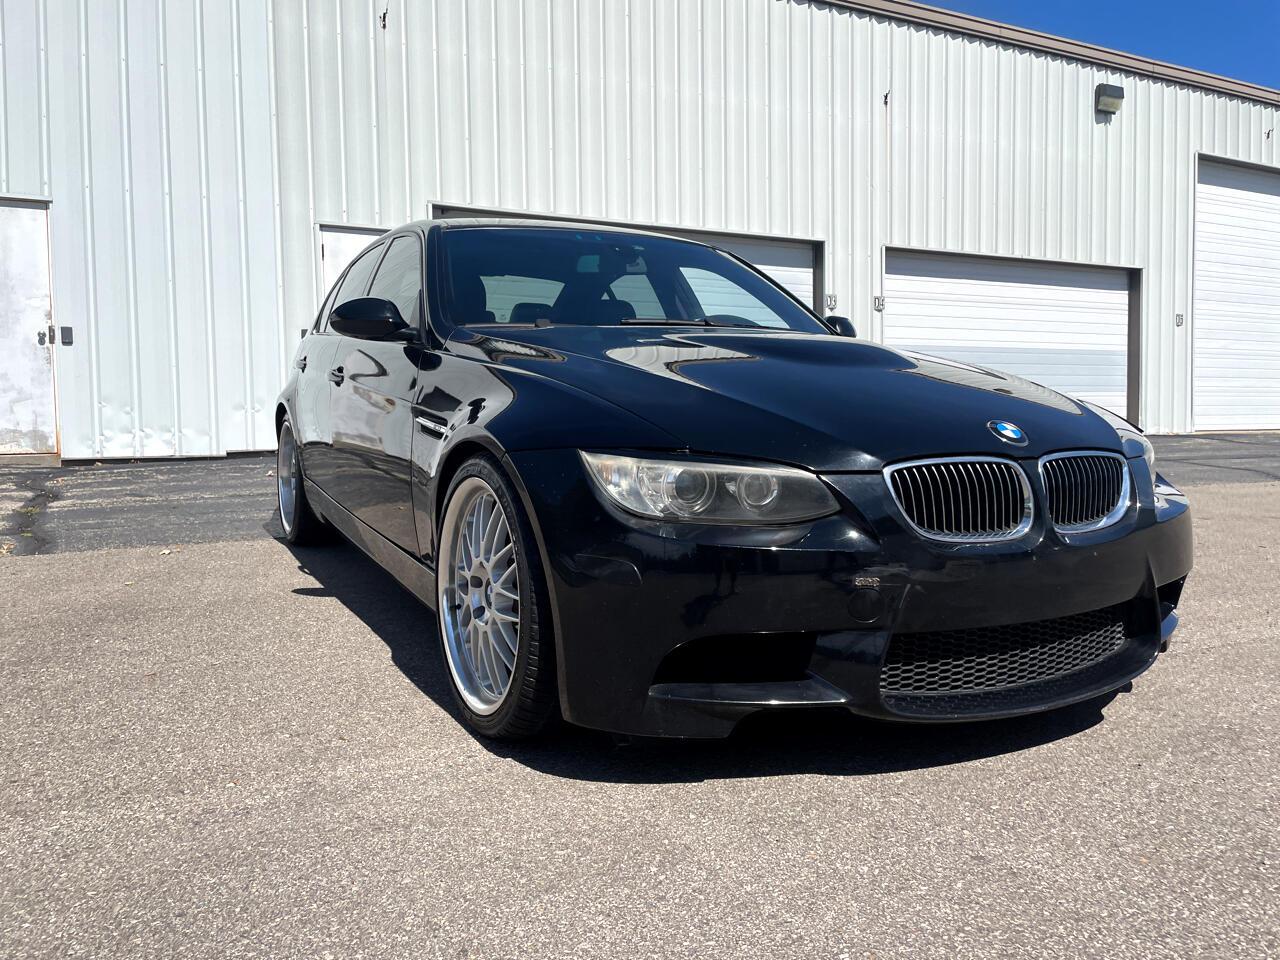 BMW 3 Series 4dr Sdn M3 2008